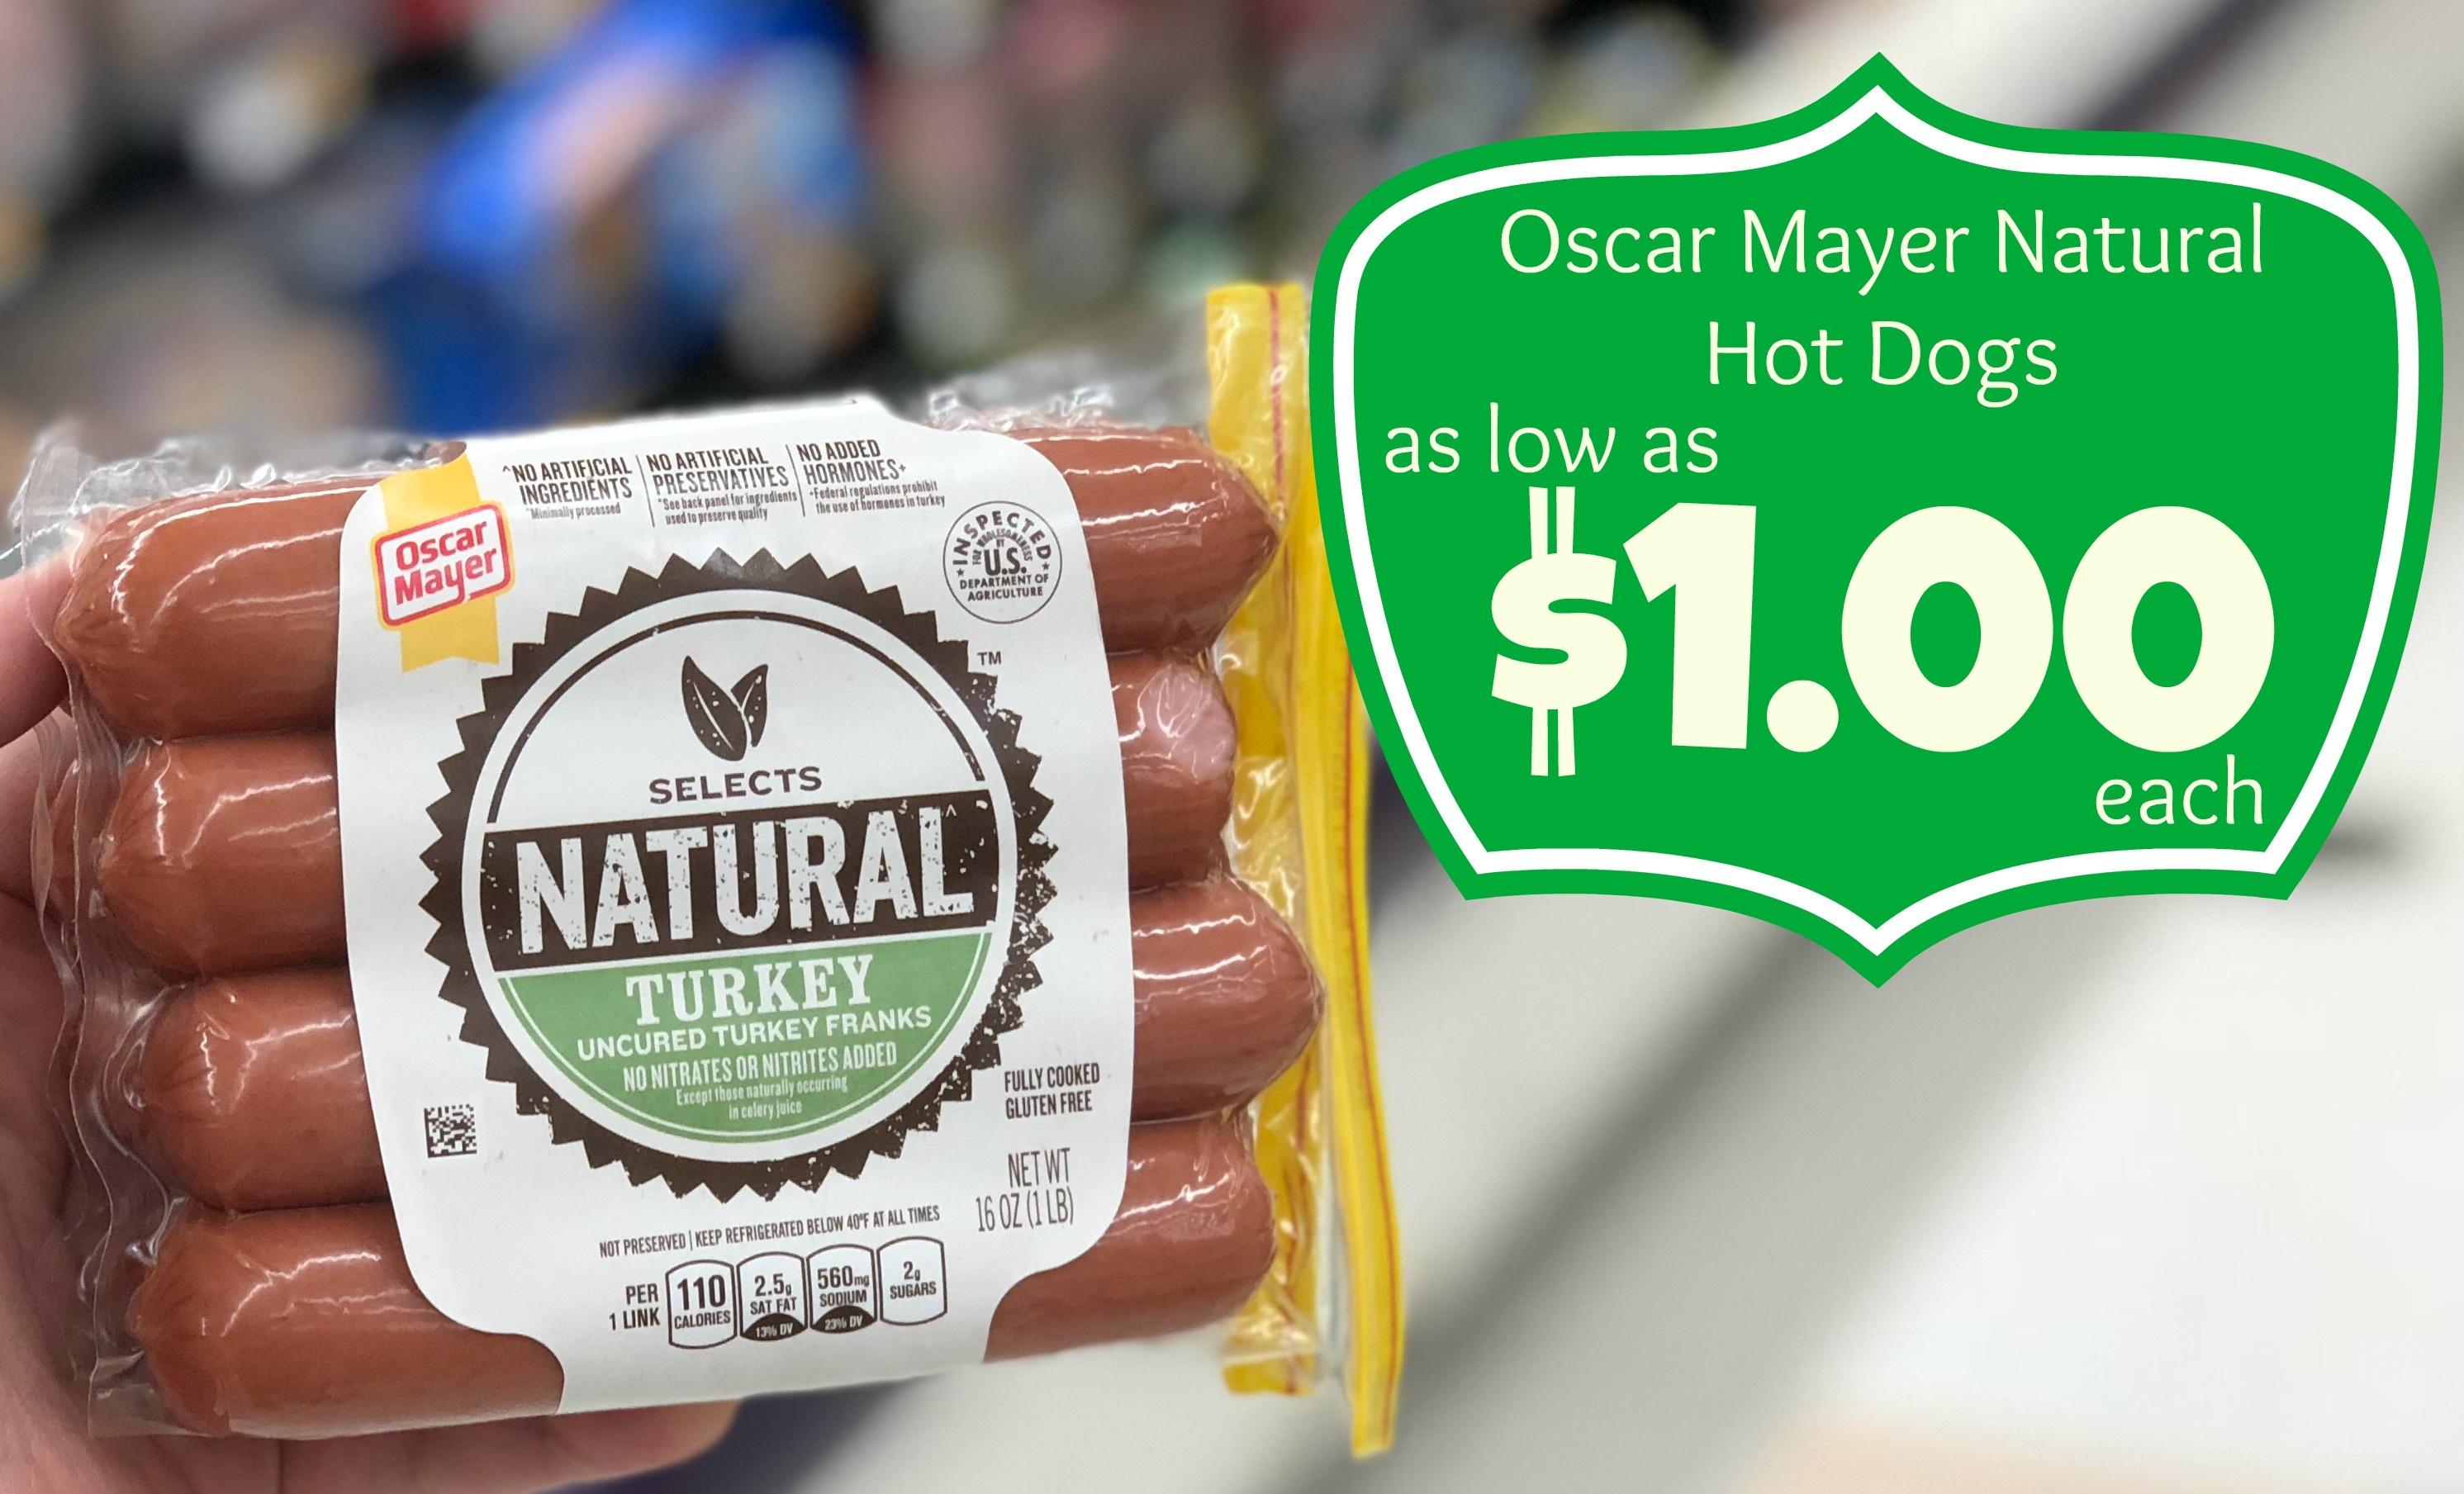 Oscar Mayer Natural Hot Dogs As Low As $1.00 Each At Kroger - Free Printable Oscar Mayer Coupons